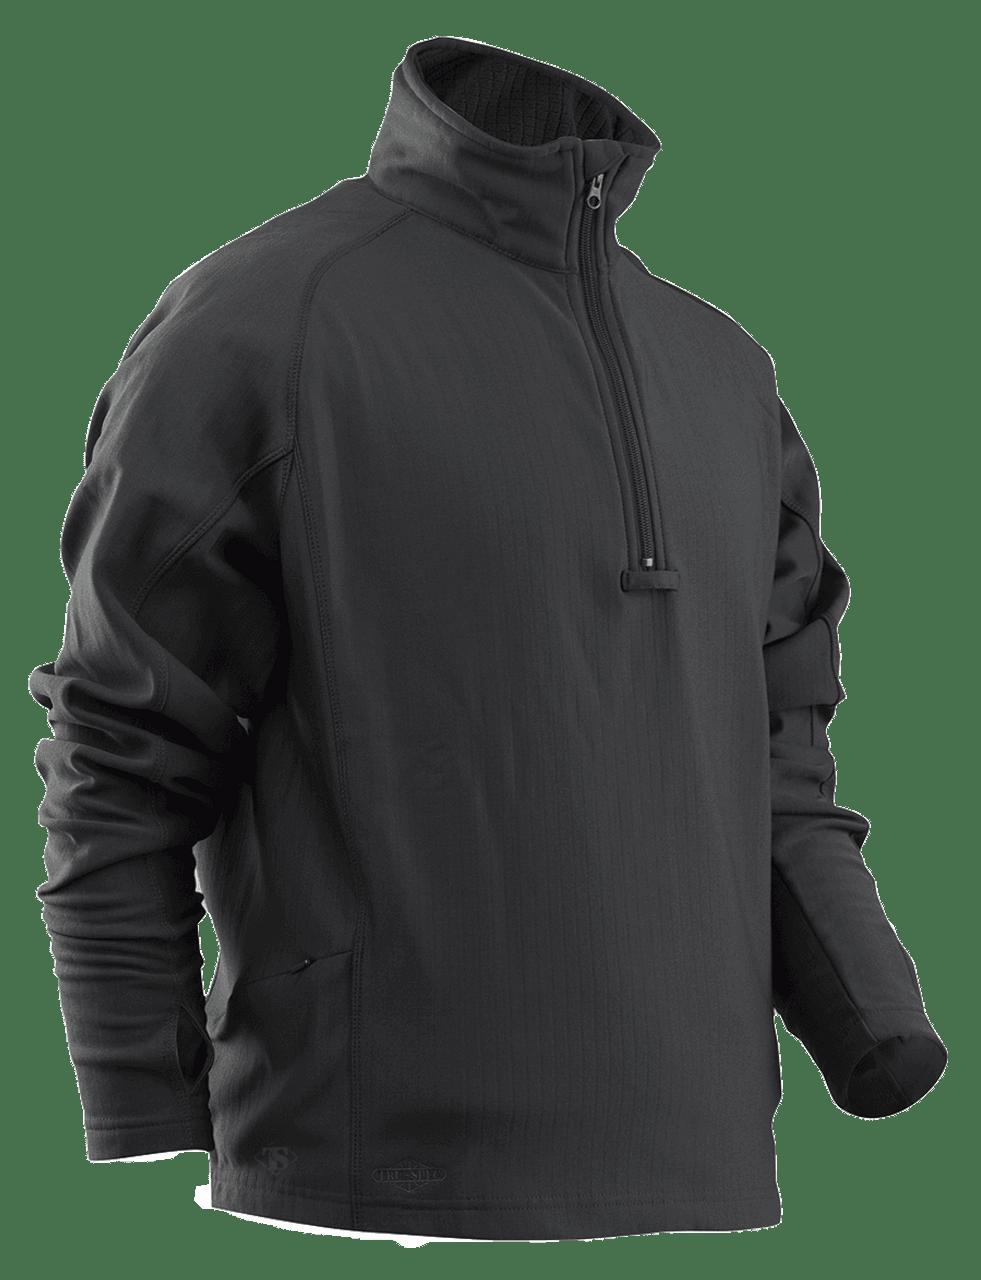 TRU-SPEC 24-7 Series Grid Fleece Pullover Black Coyote